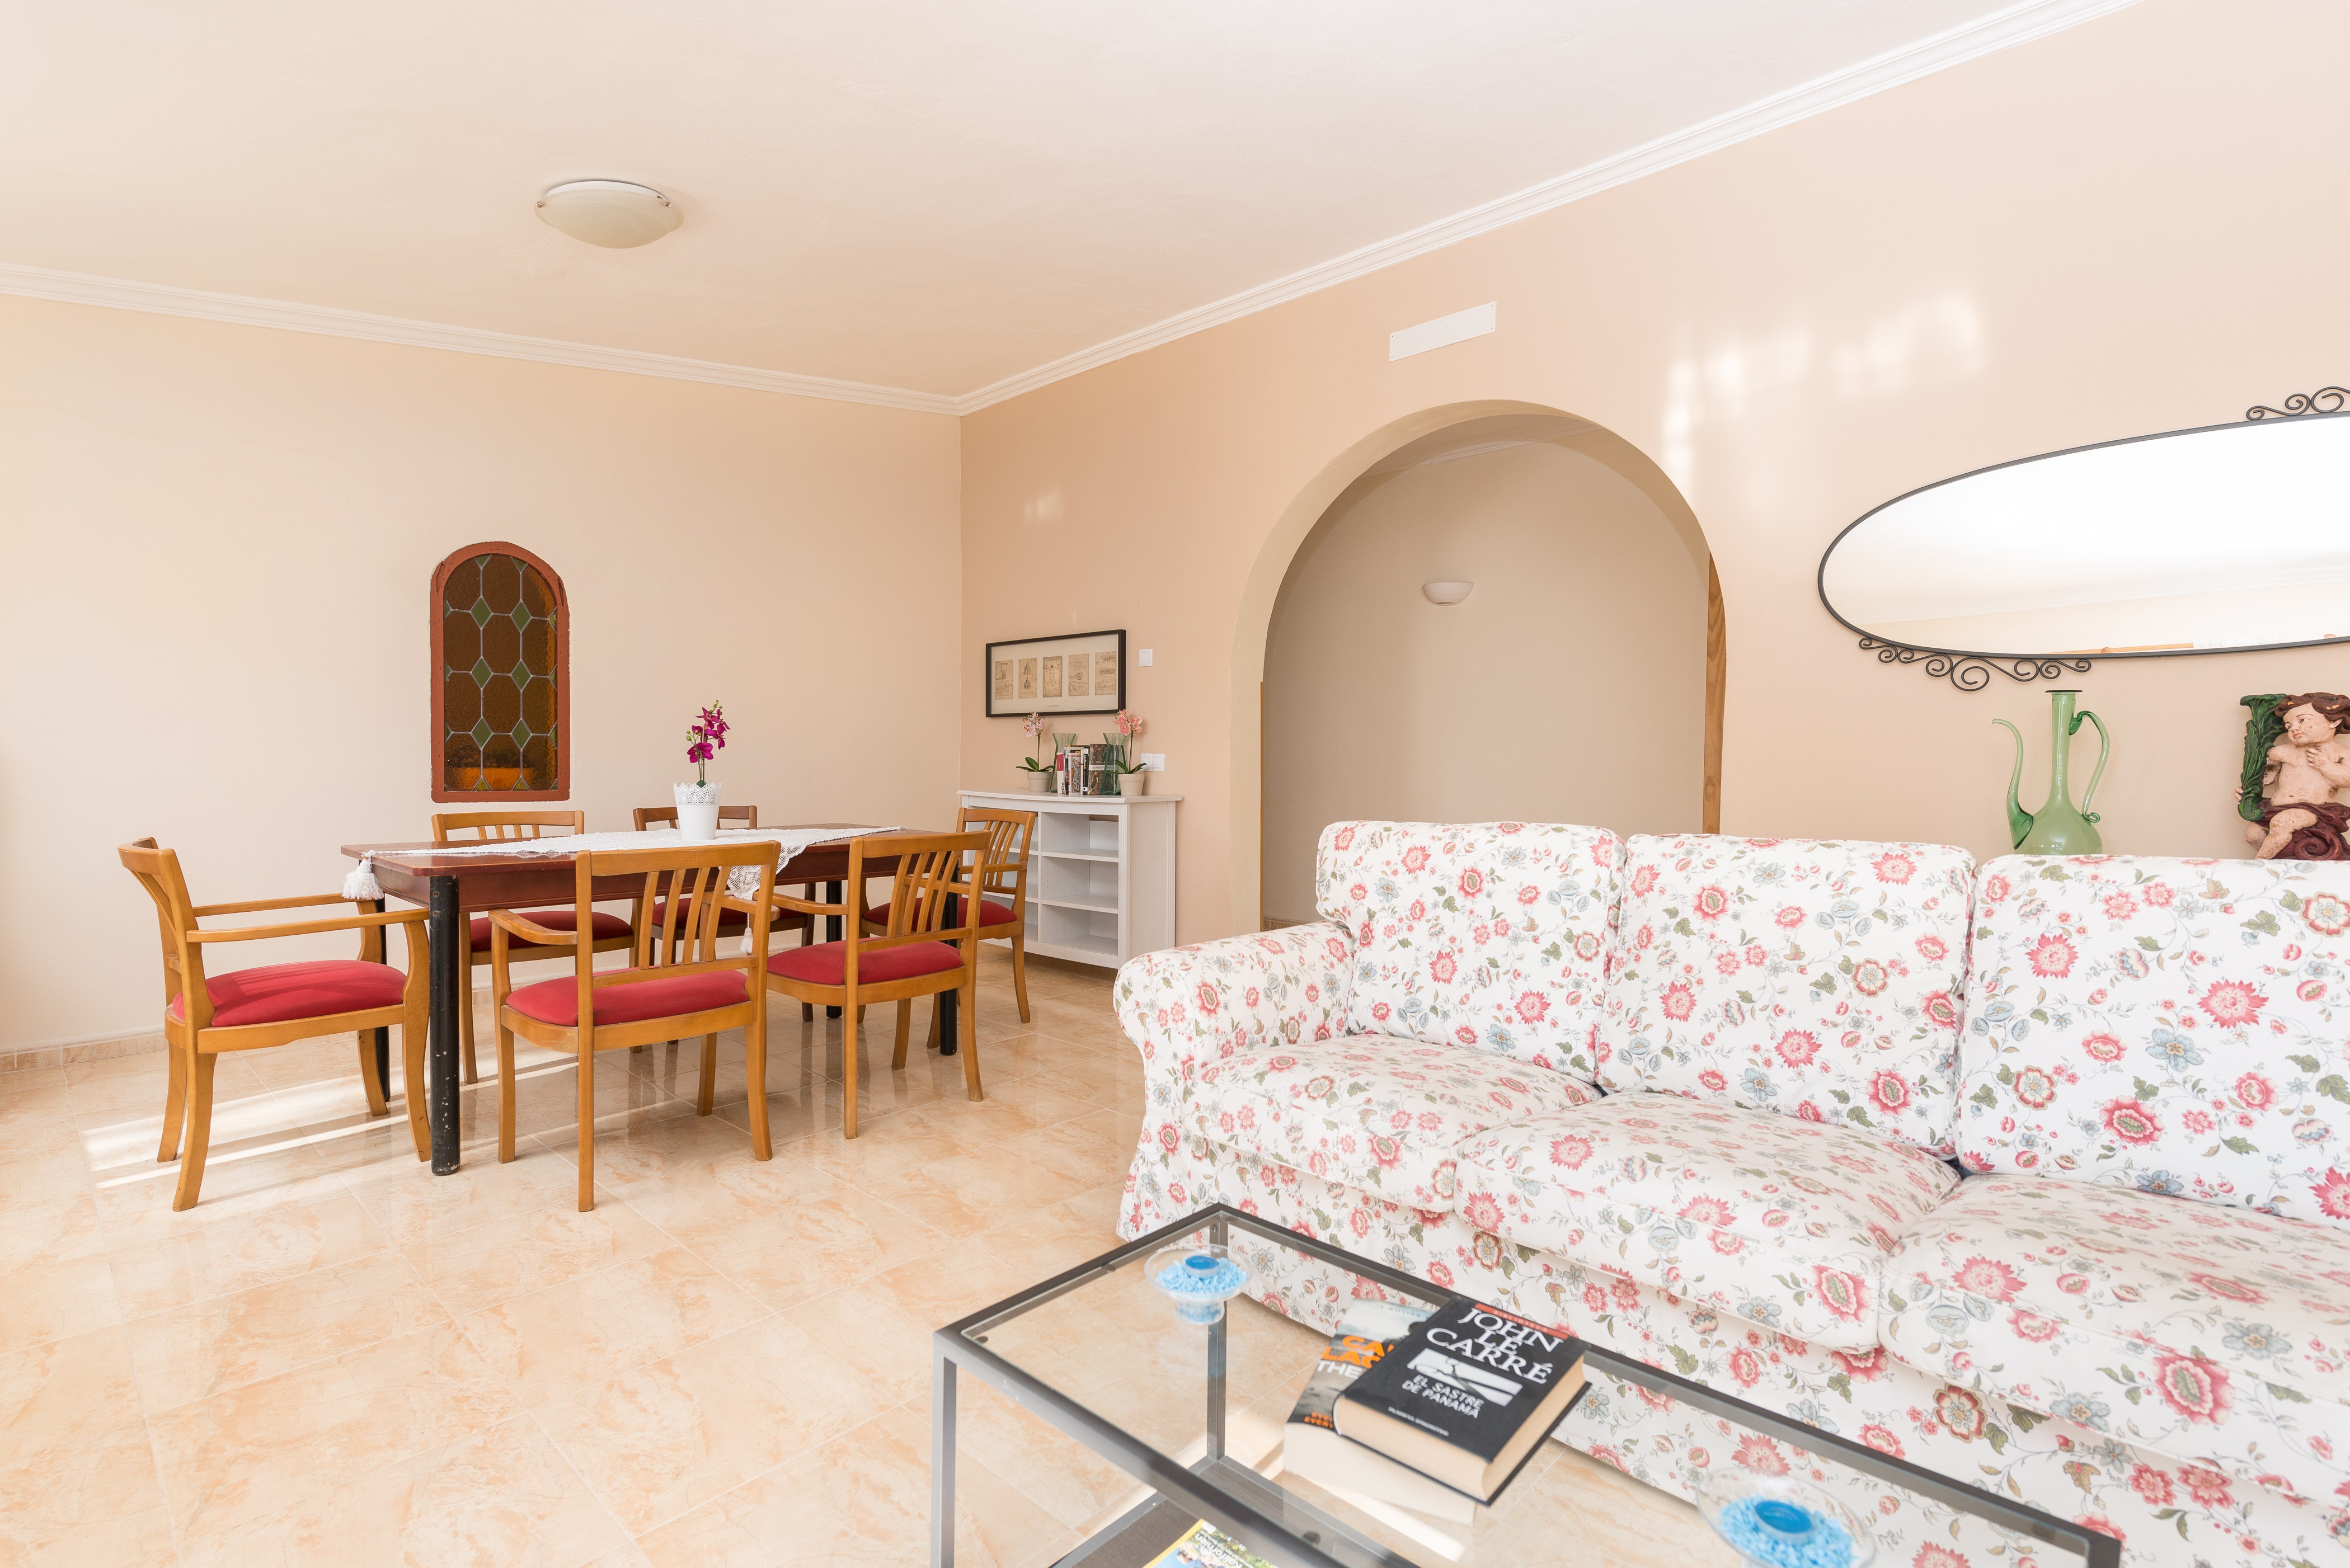 Ferienhaus CAN MOLINA (2063640), Cala Mandia, Mallorca, Balearische Inseln, Spanien, Bild 14